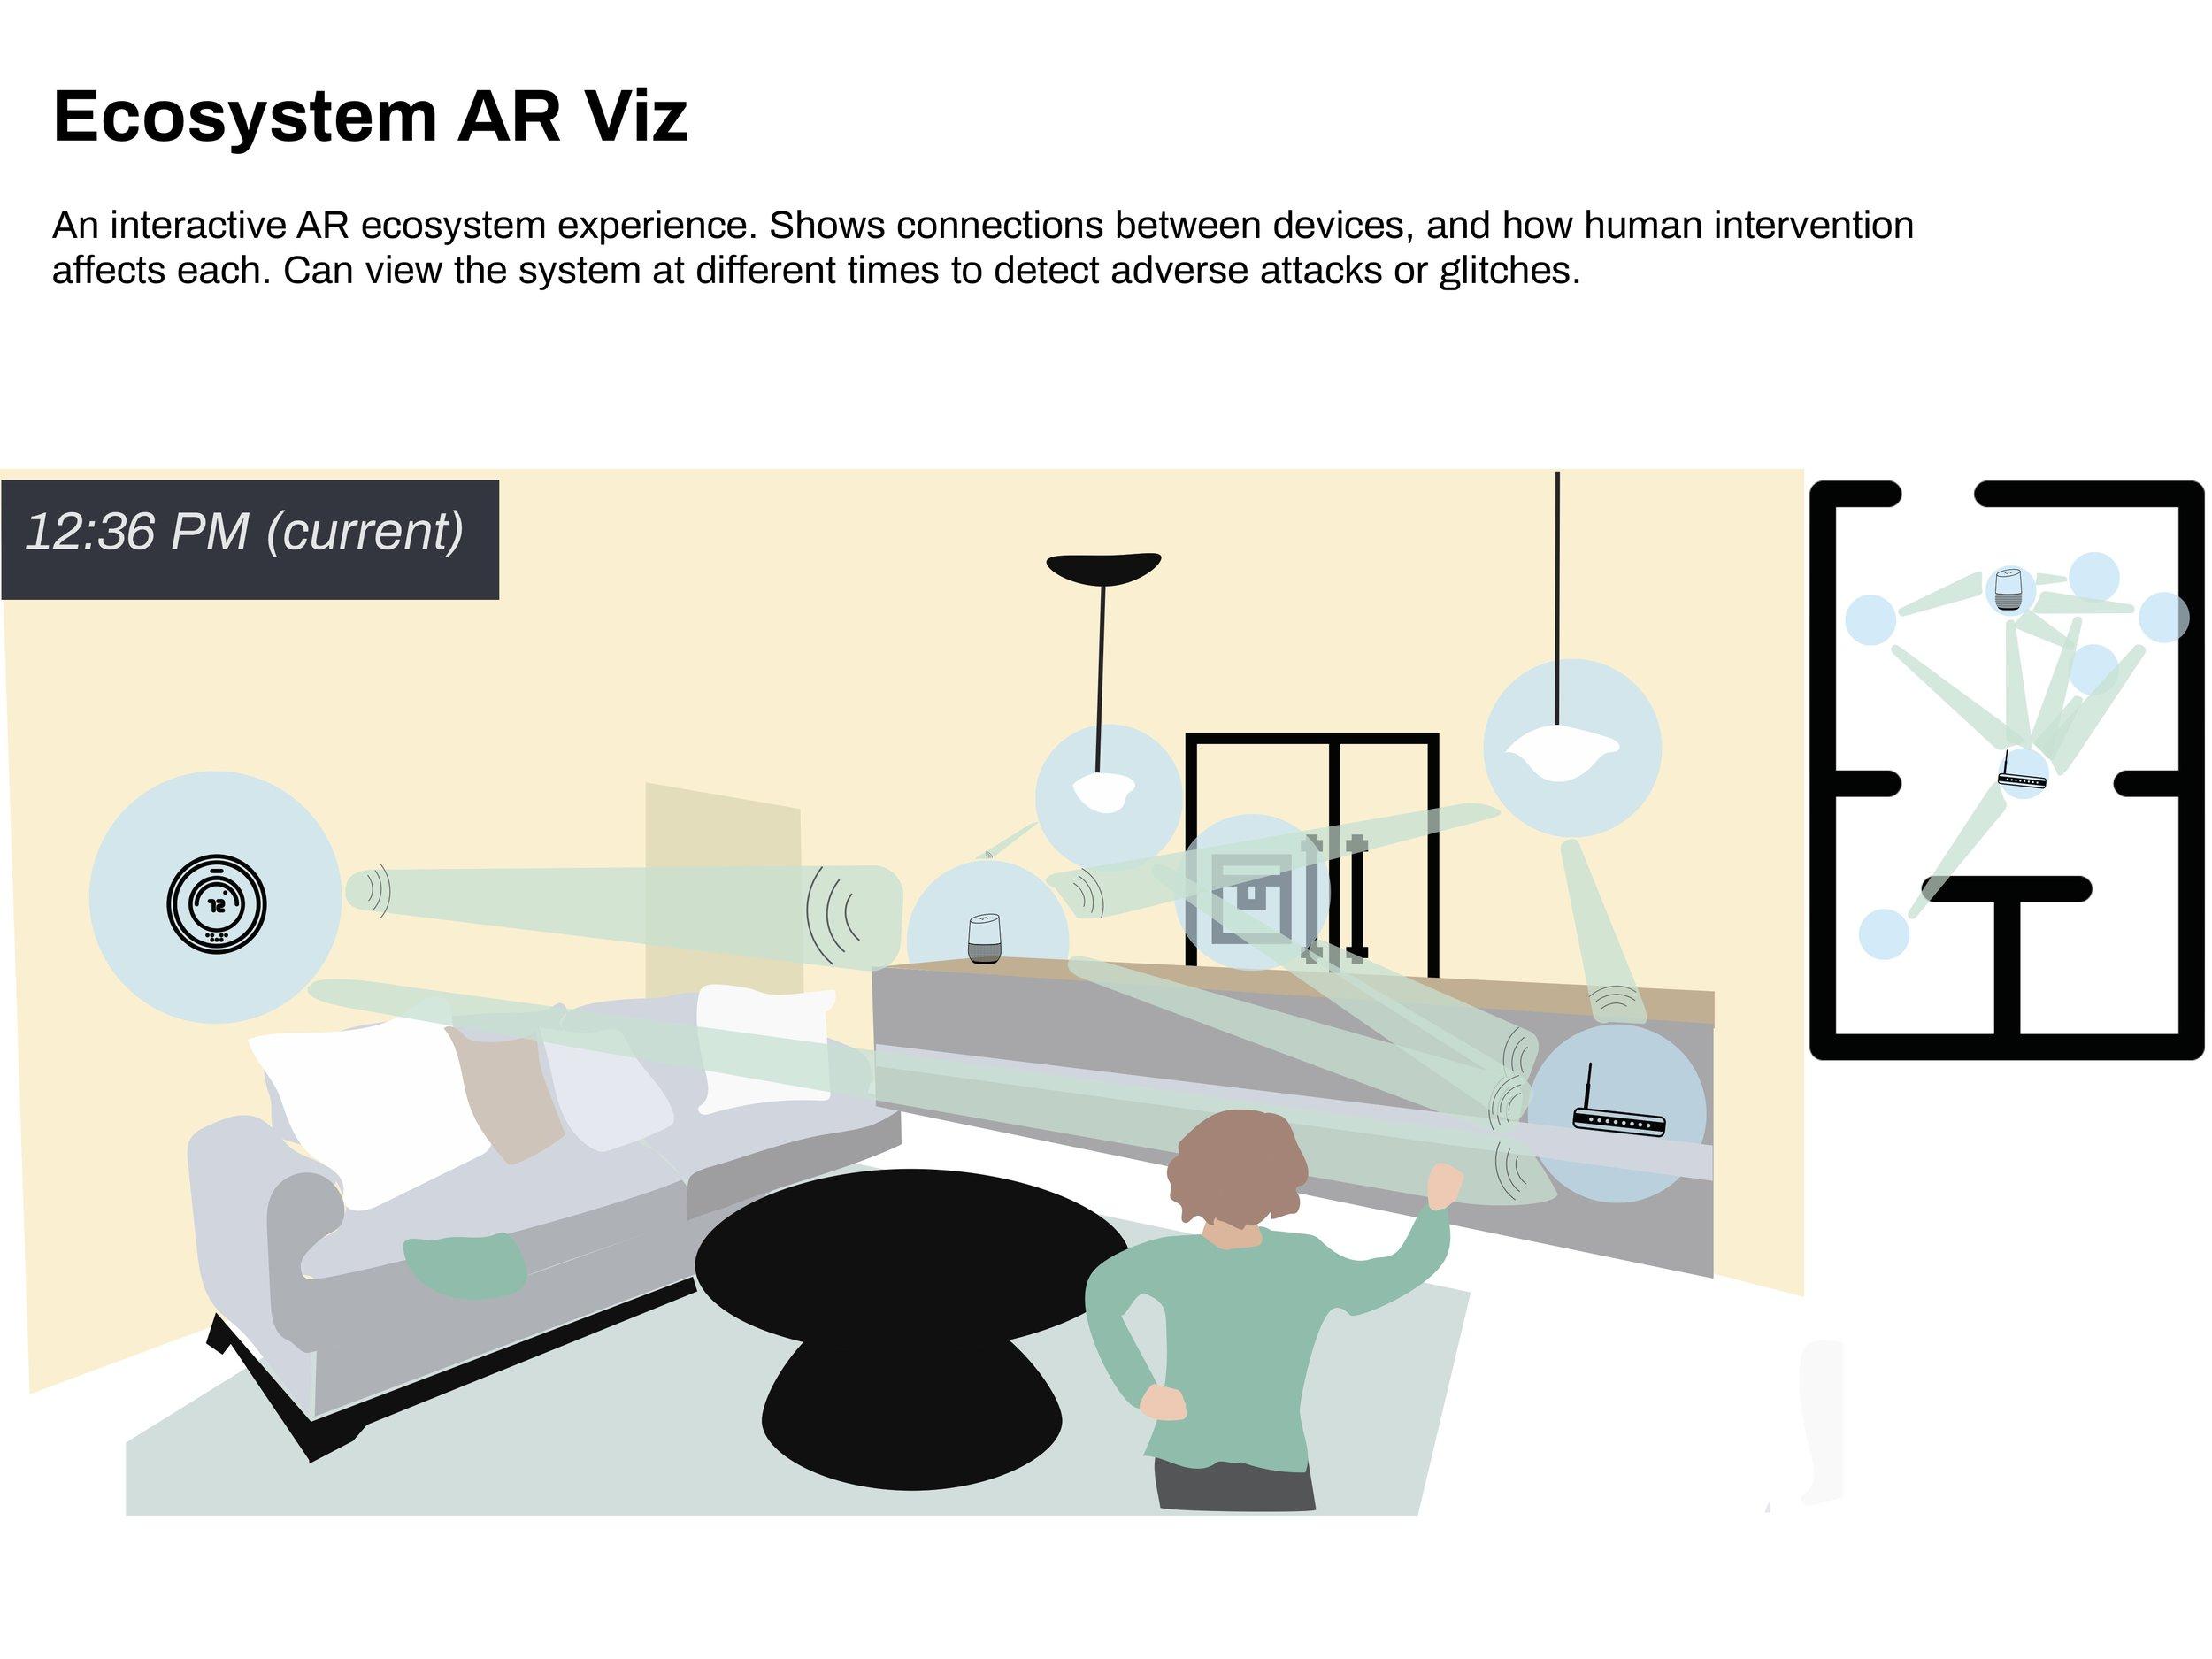 ConceptSuite_626_ForTesting_EcosystemARViz.jpg